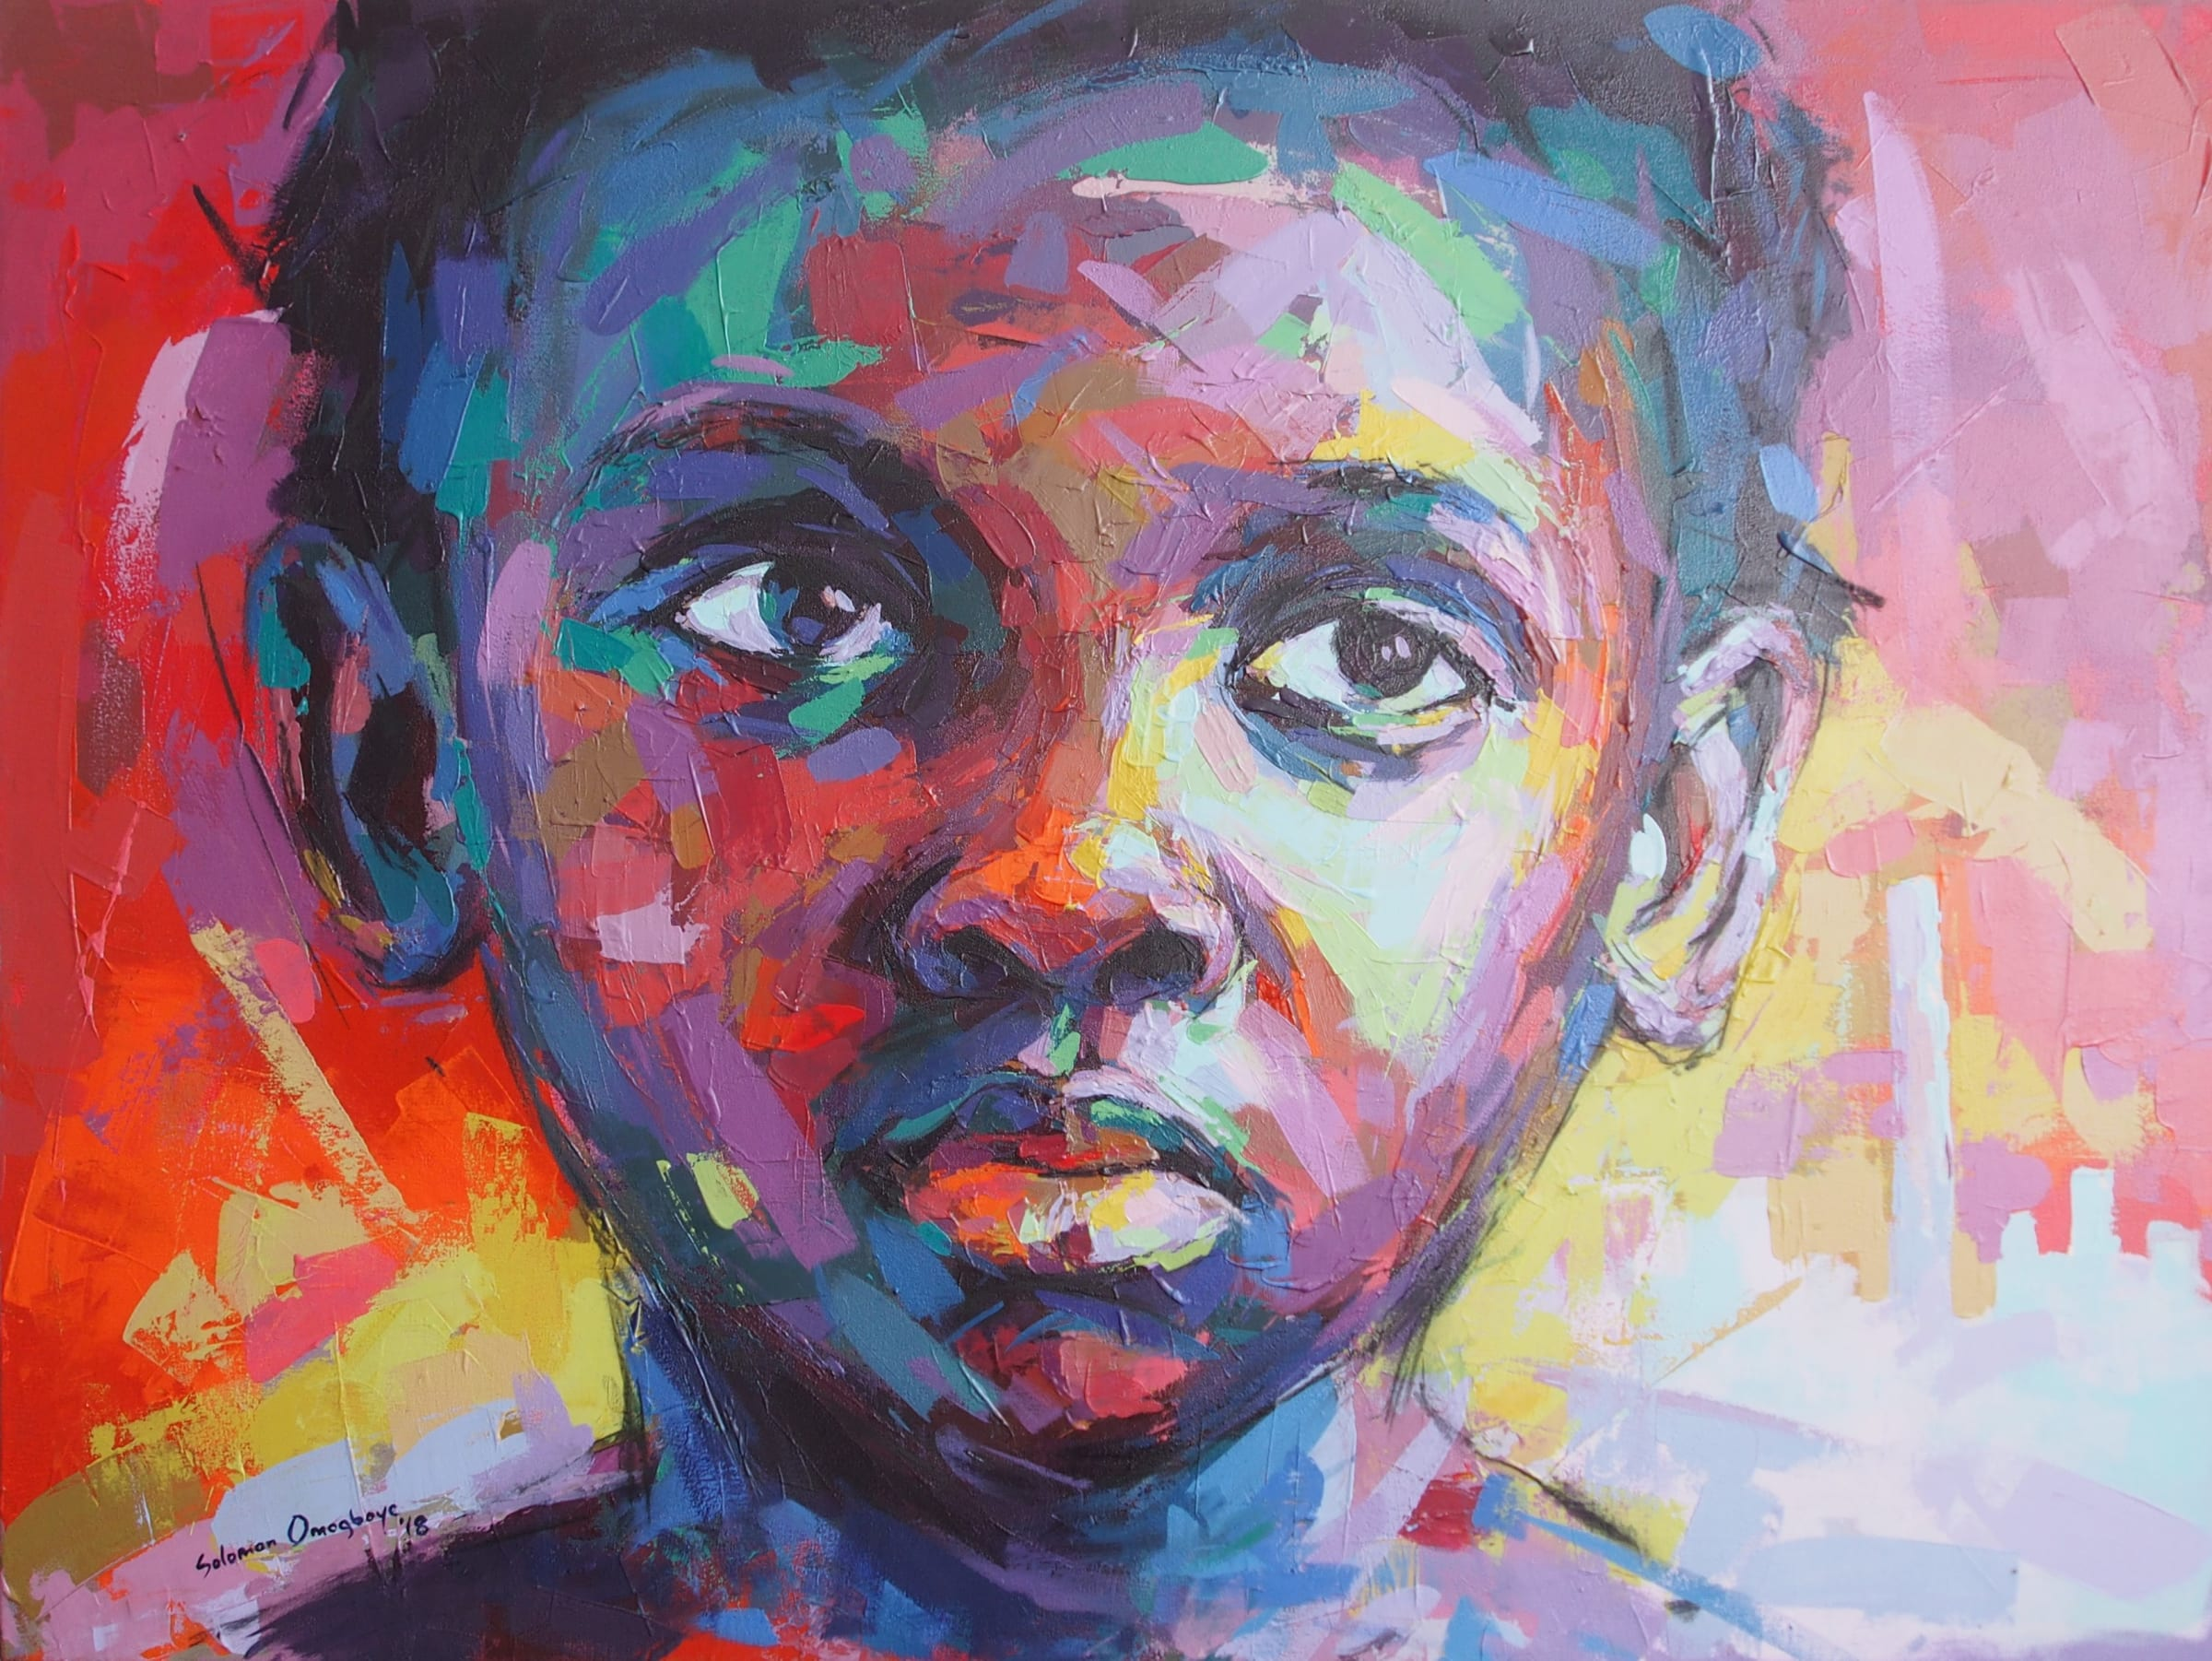 <span class=&#34;link fancybox-details-link&#34;><a href=&#34;/artists/39-solomon-omogboye/works/2016-solomon-omogboye-jozi-girl-2018/&#34;>View Detail Page</a></span><div class=&#34;artist&#34;><strong>Solomon Omogboye</strong></div> <div class=&#34;title&#34;><em>Jozi Girl</em>, 2018</div> <div class=&#34;medium&#34;>Acrylic On Canvas</div> <div class=&#34;dimensions&#34;>122cm x 91.5cm</div>